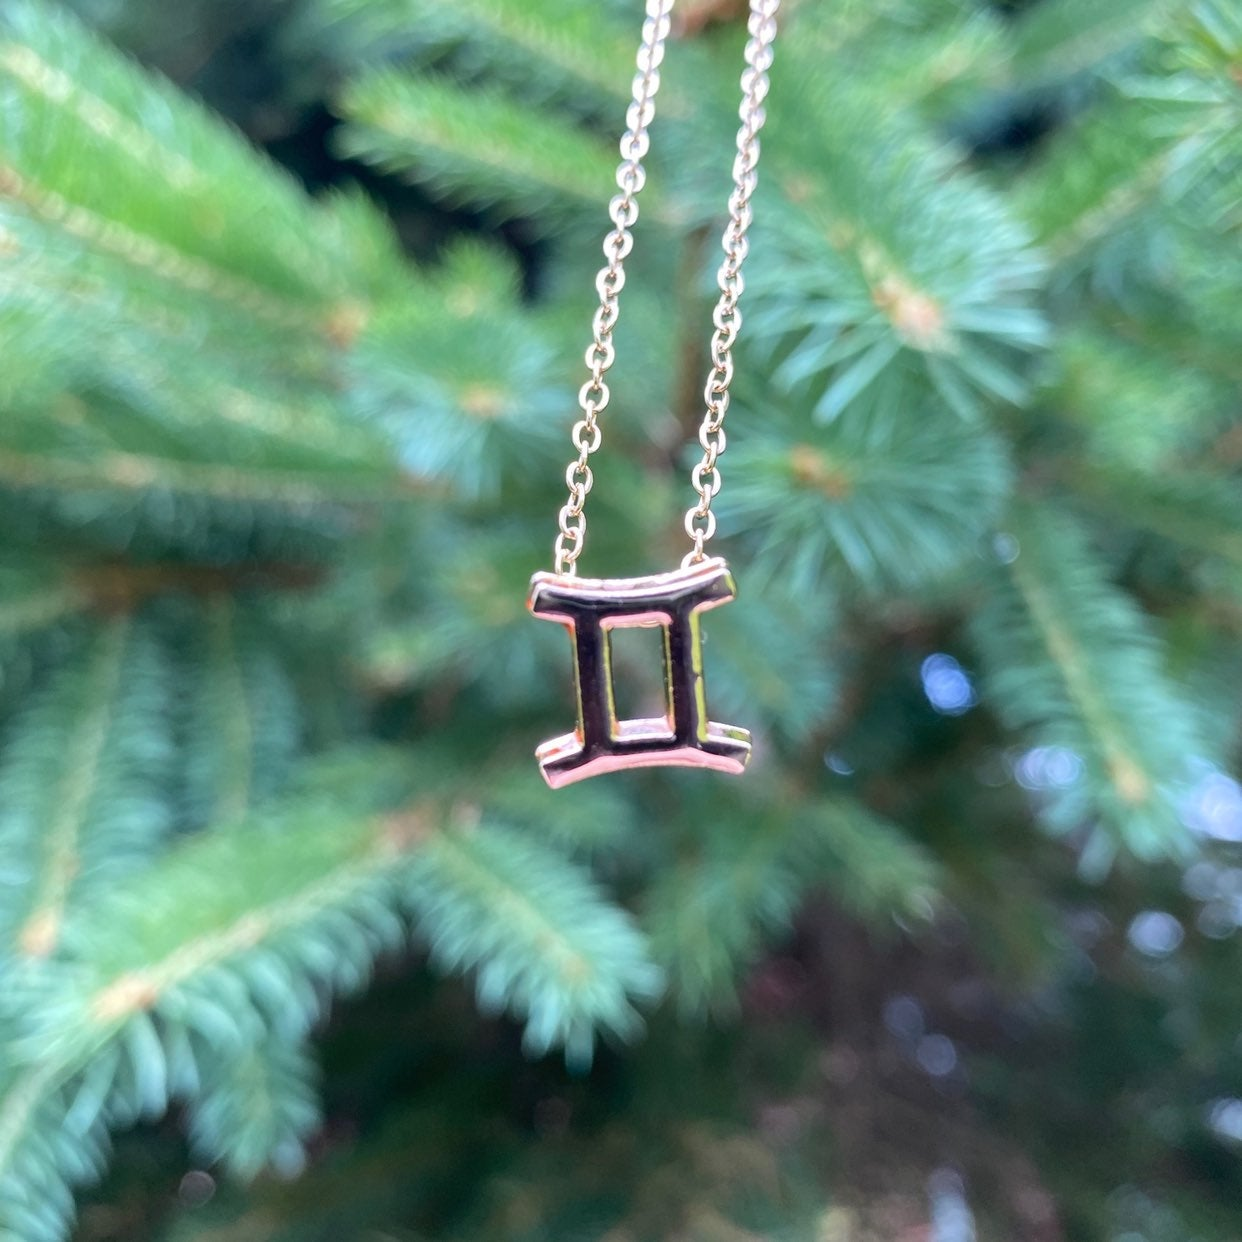 Gemini Necklace - Gold, Astrology,Zodiac